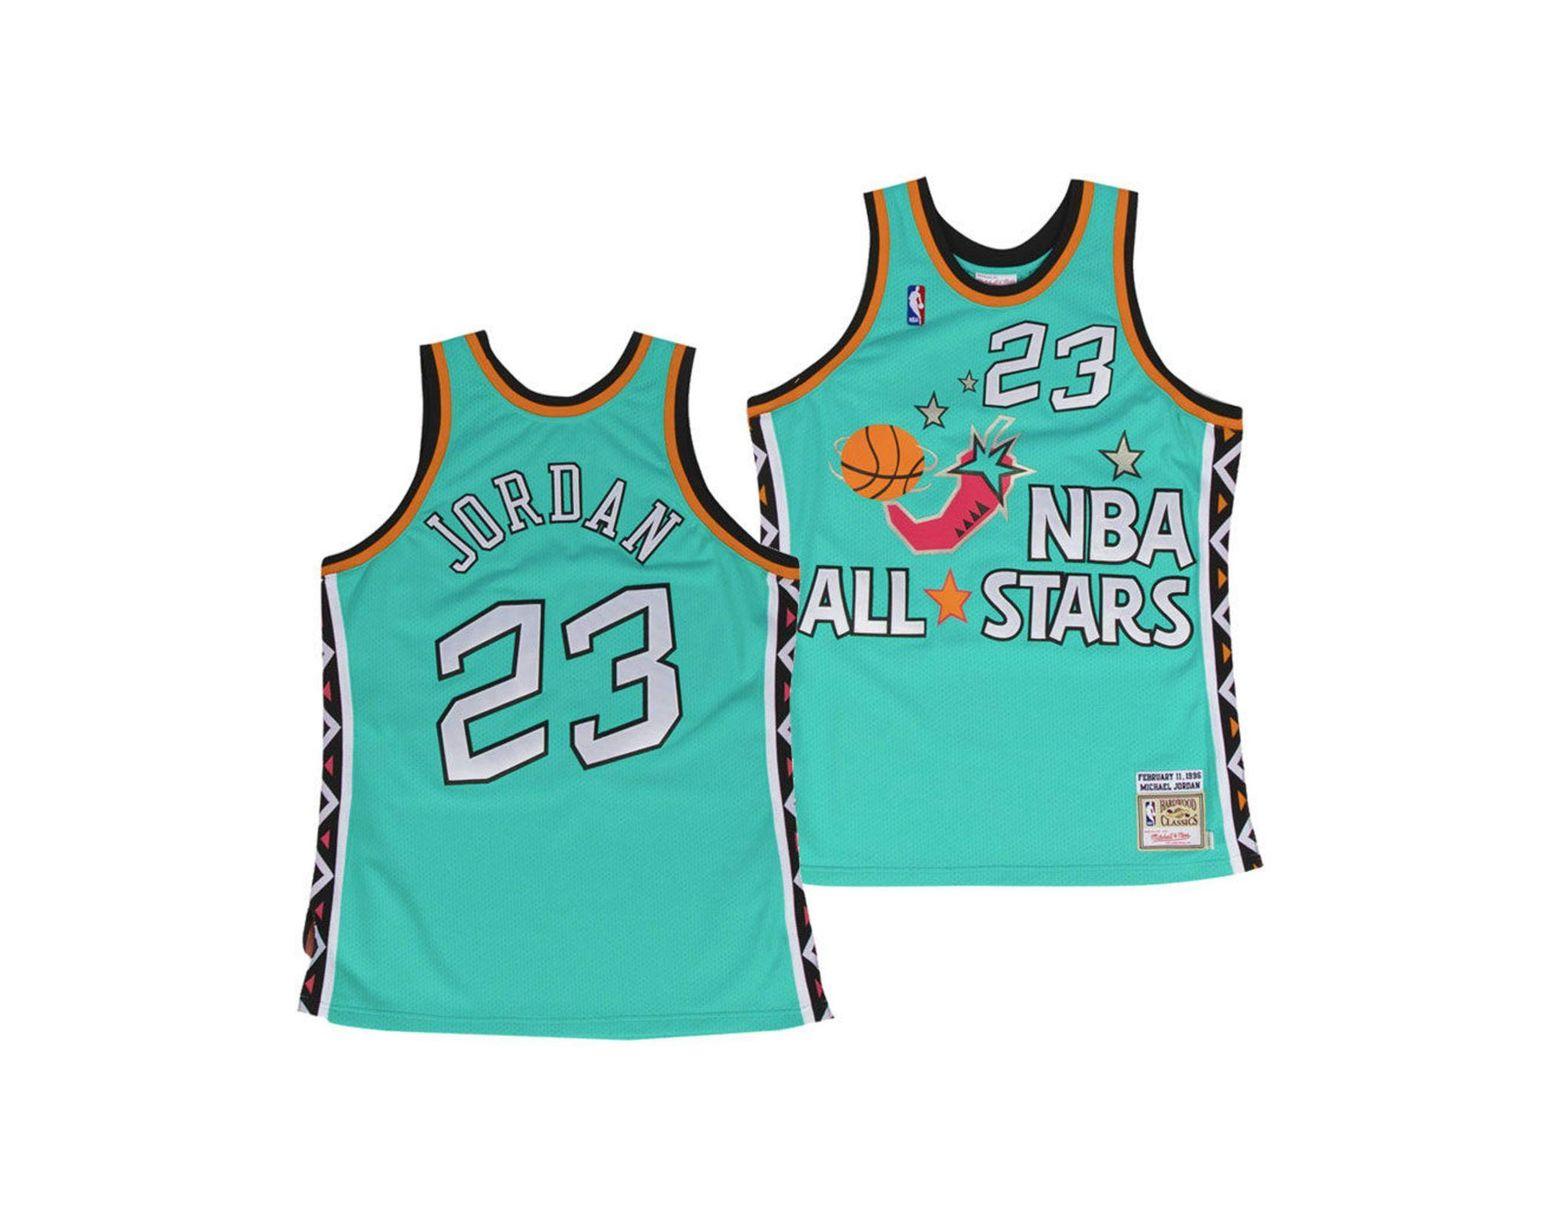 timeless design 70fbc 13835 Men's Blue Michael Jordan 1996 Nba All Star Authentic Jersey